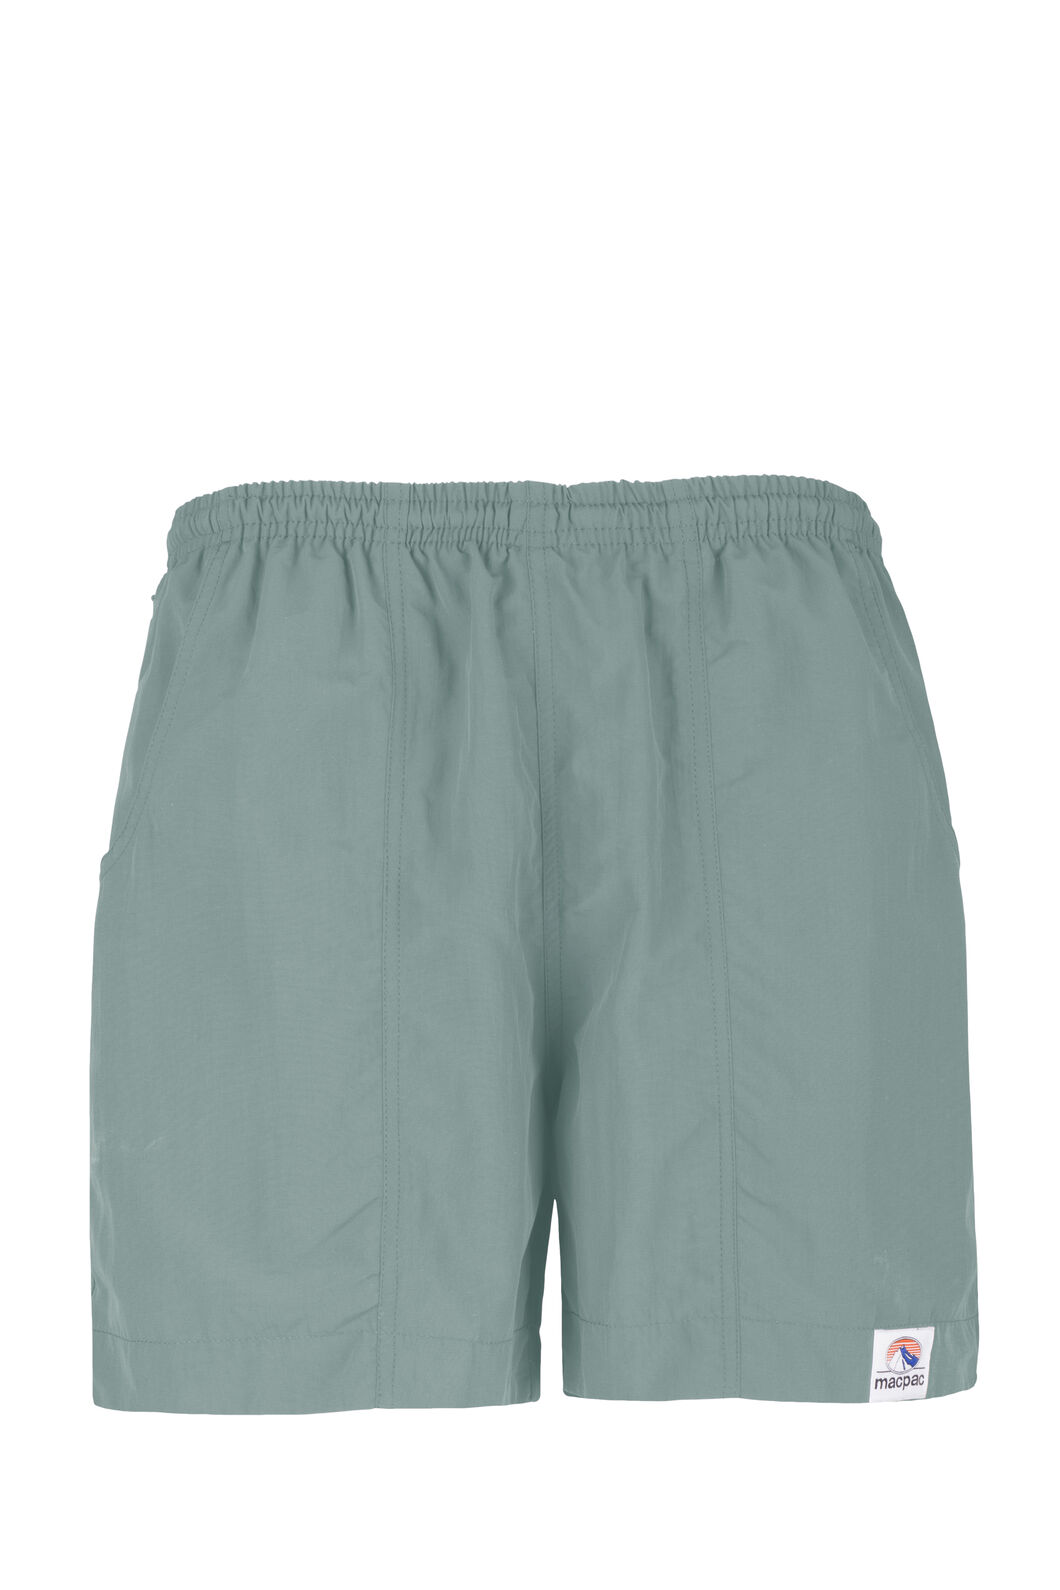 Macpac Winger Shorts - Men's, Stormy Sea, hi-res